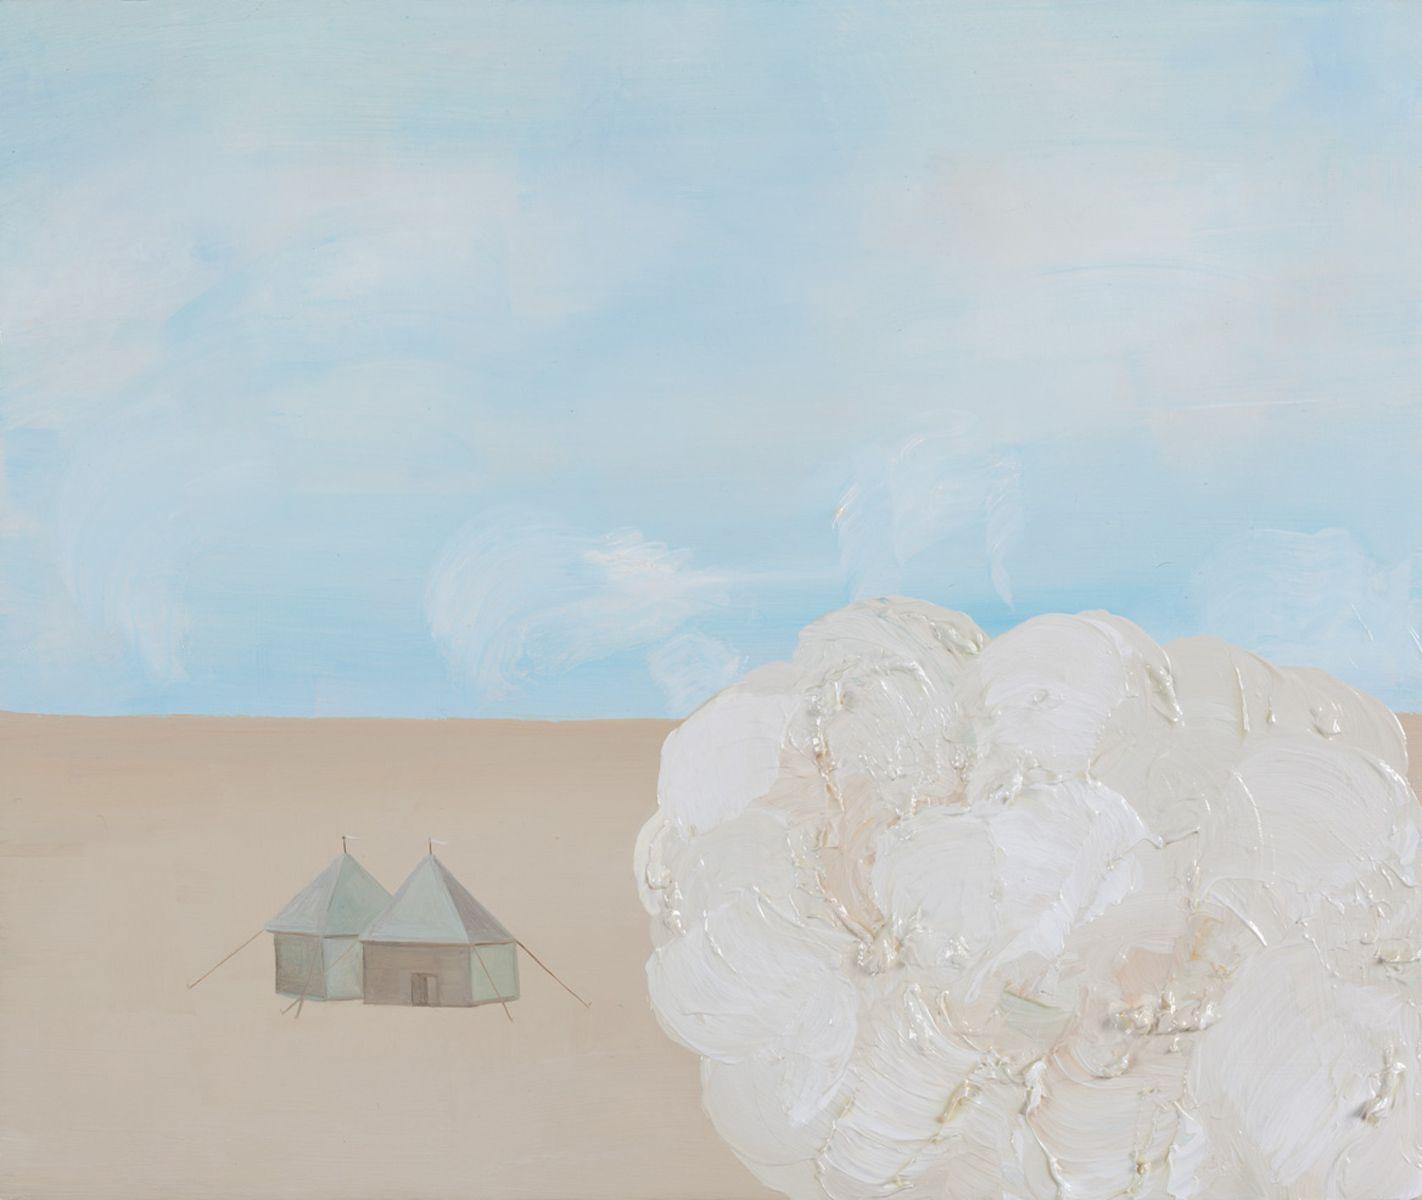 Sand Storm #2